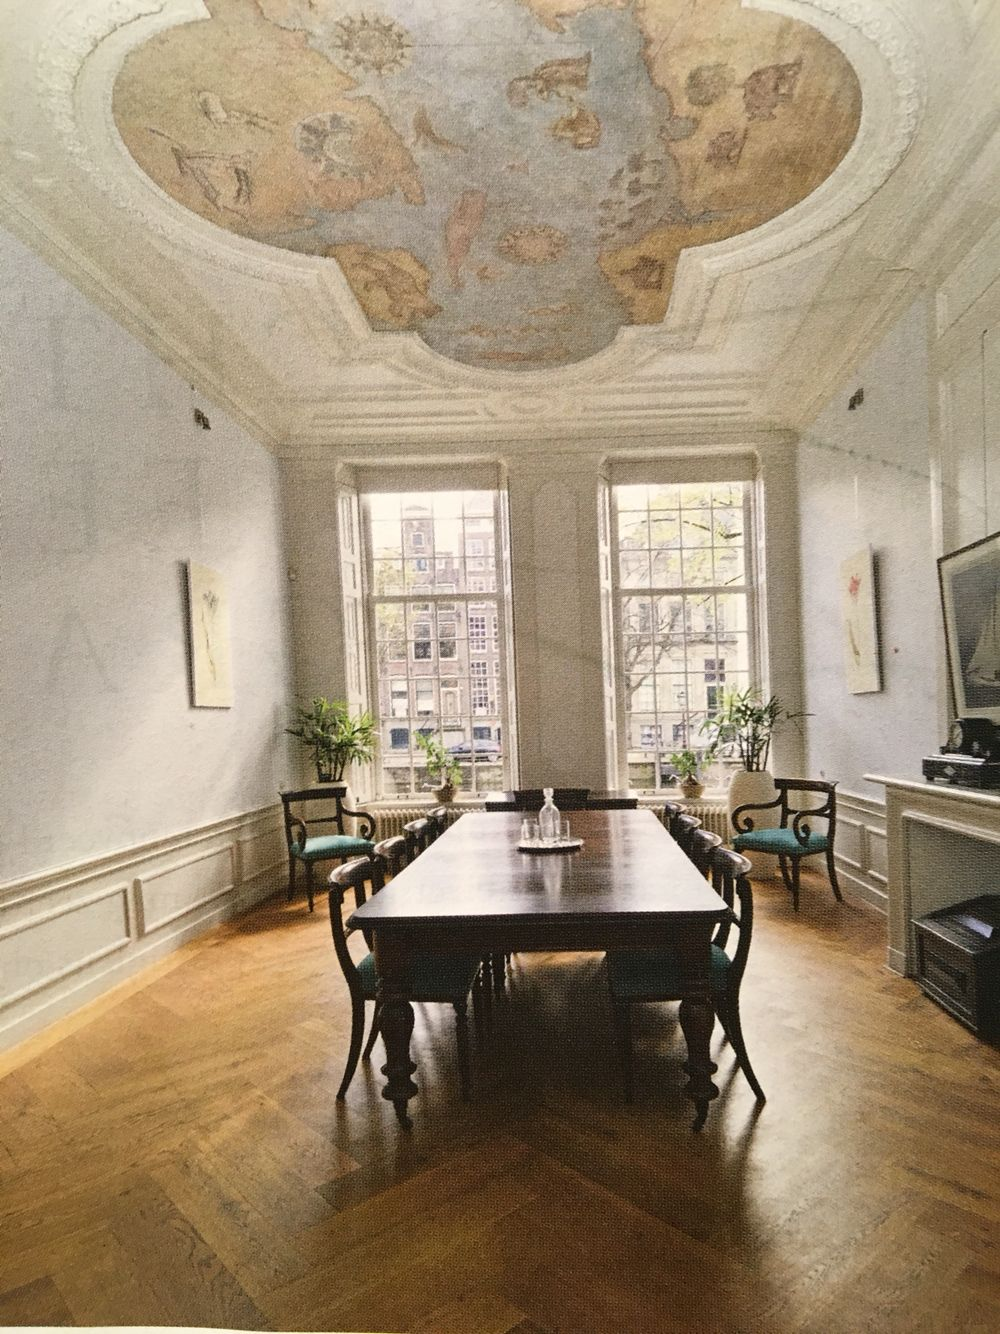 Brieke also best internal house images diy ideas for home decor rh pinterest